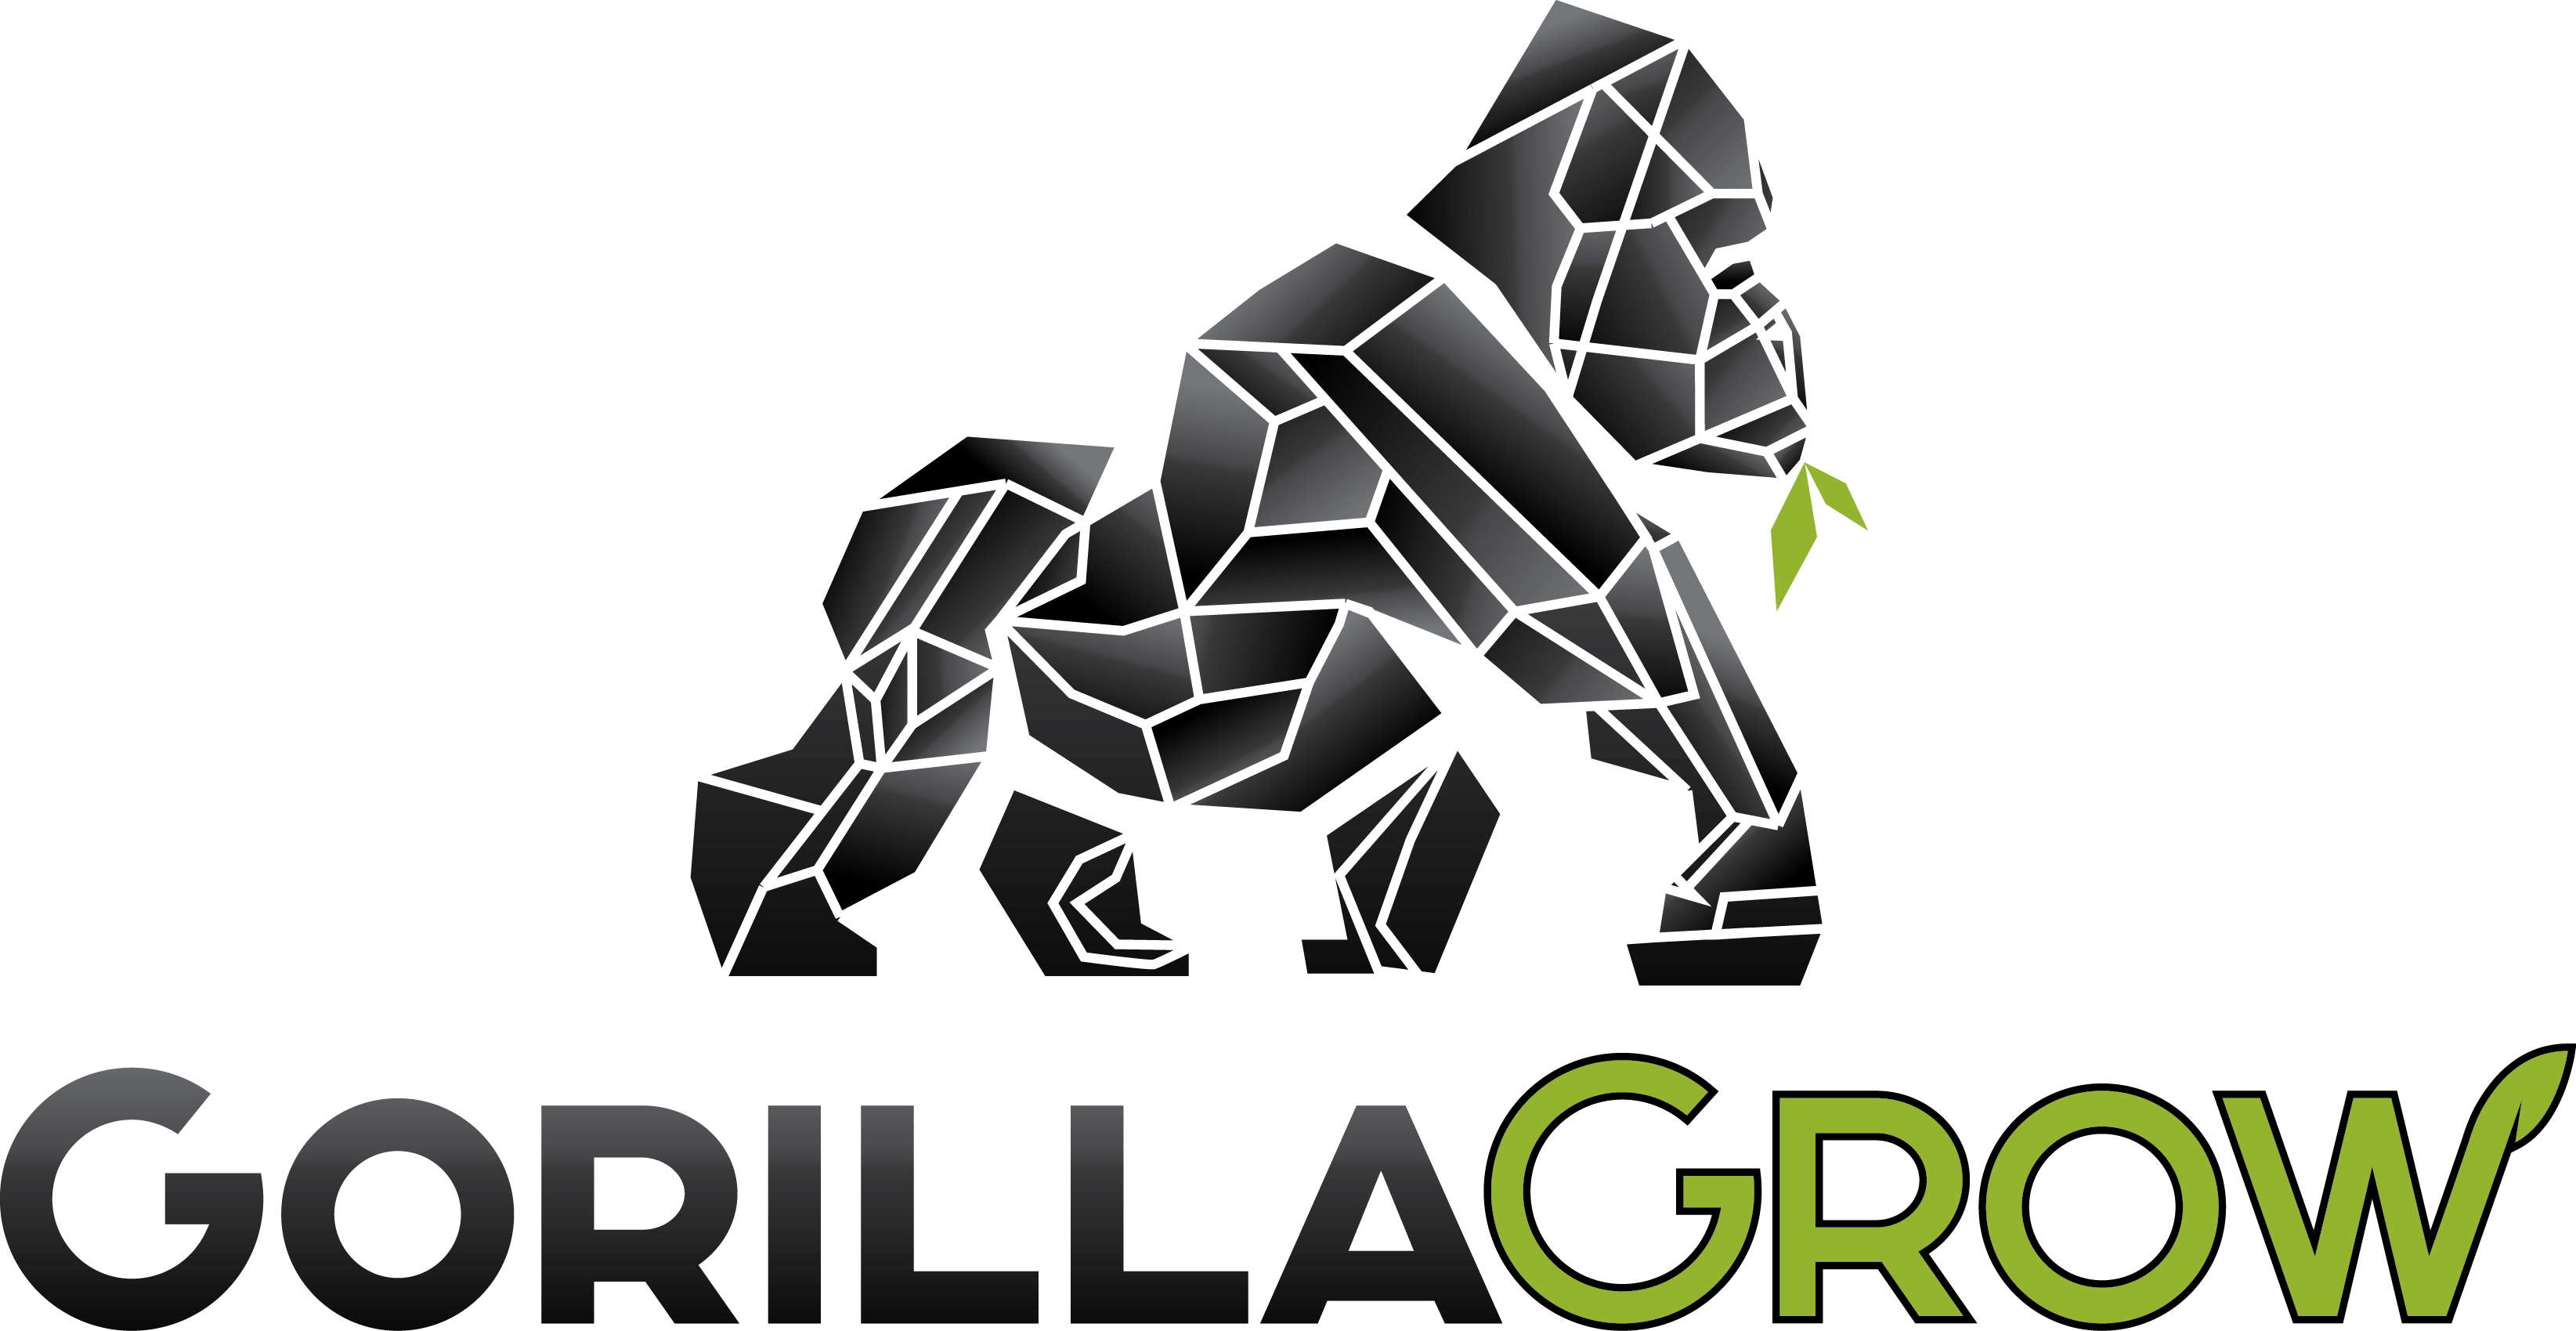 Iconic gorilla logo, anime or comic appearance